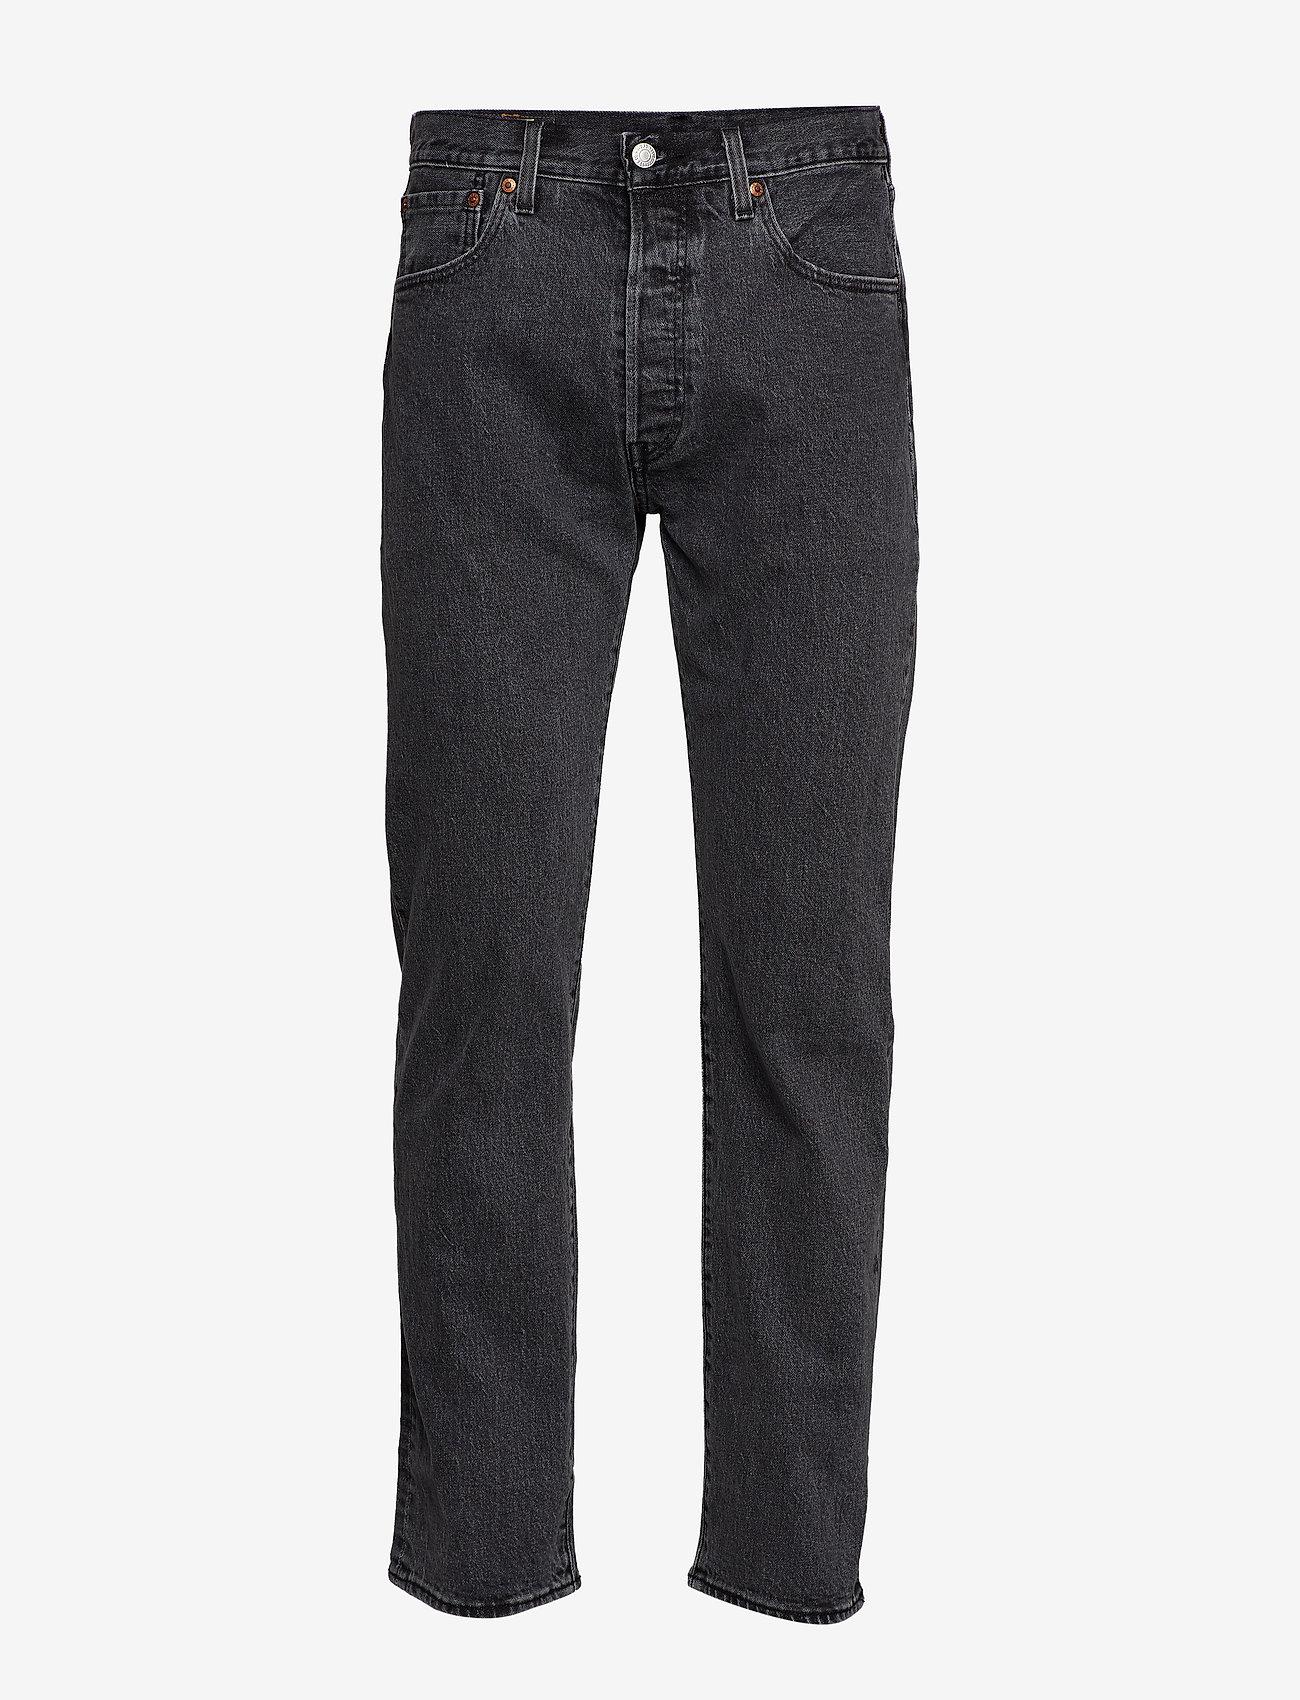 LEVI´S Men - 501 93 STRAIGHT RAISIN STONE - regular jeans - med indigo - worn in - 1